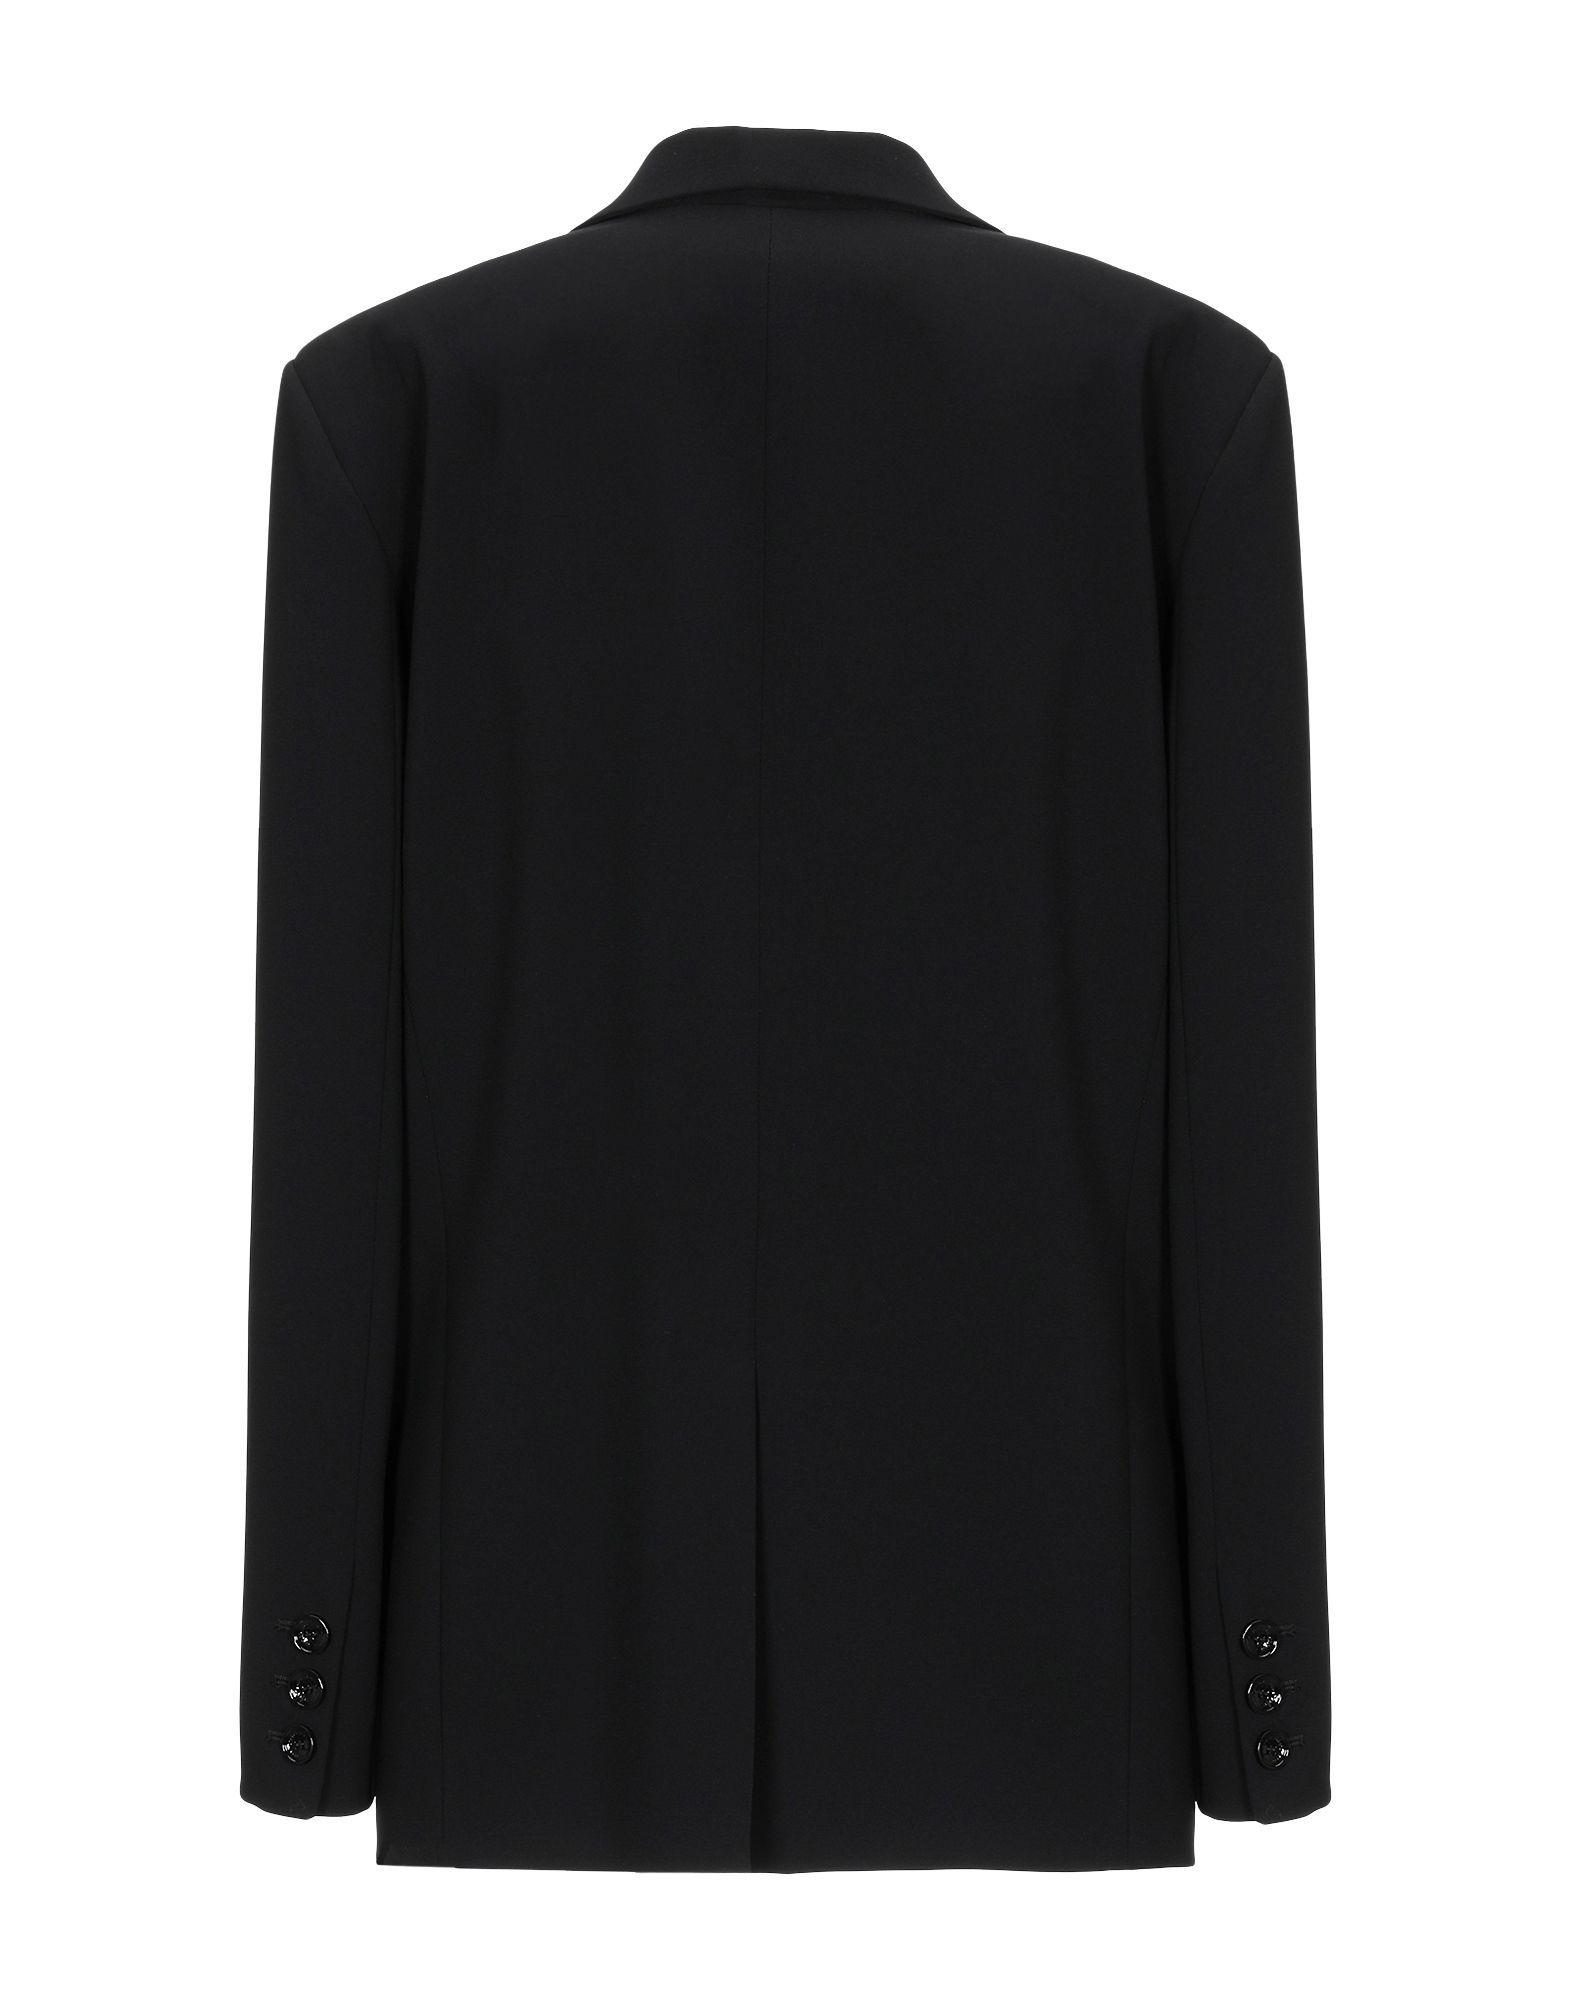 Patrizia Pepe Black Crepe Single Breasted Jacket